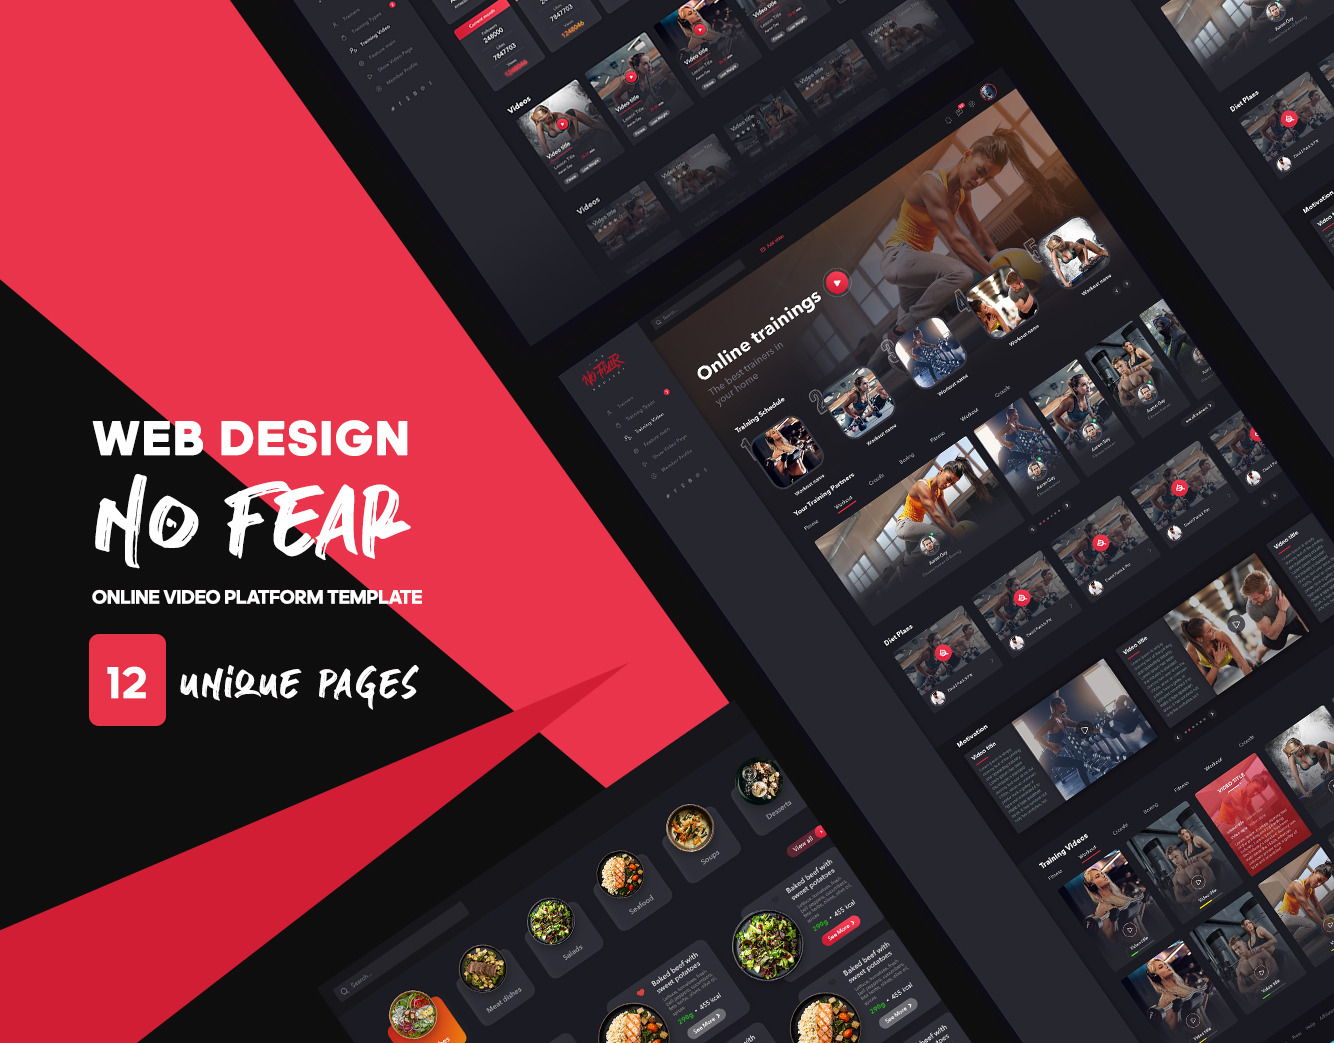 No Fear UI kit